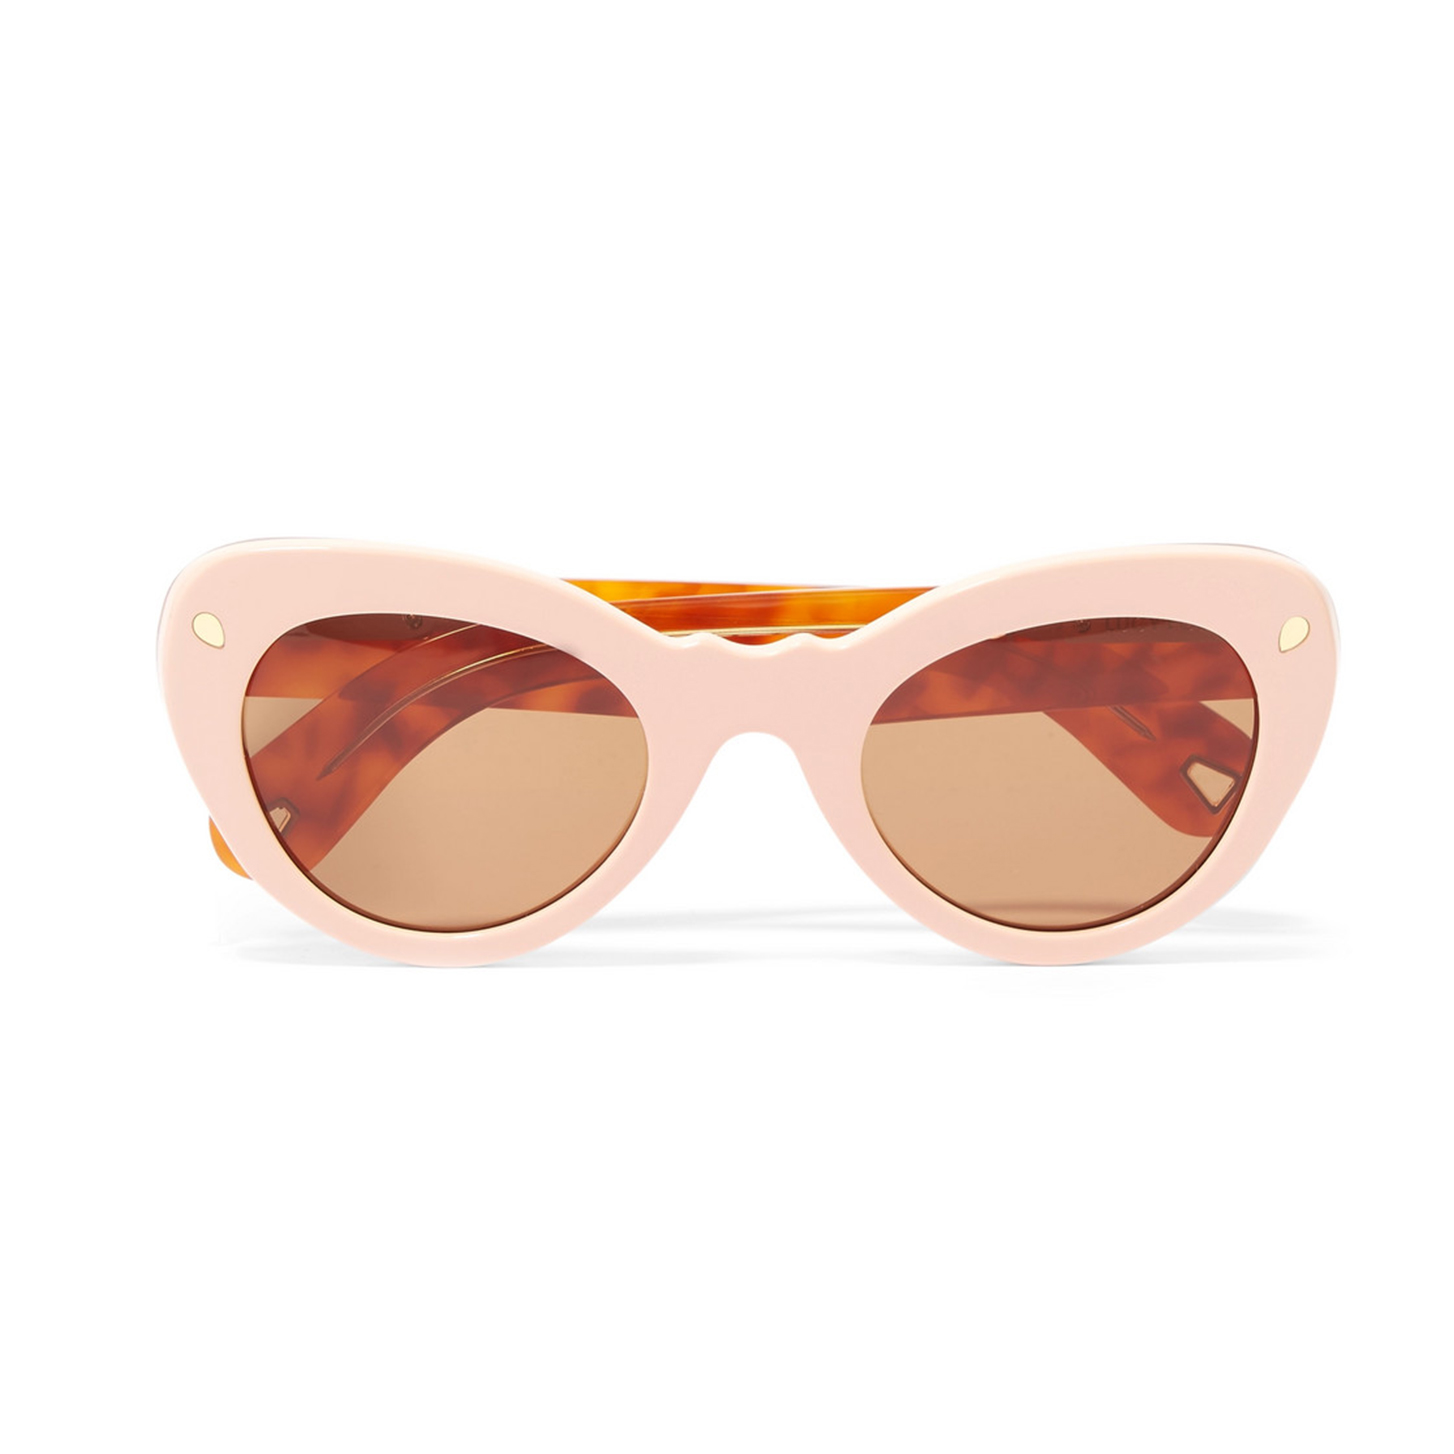 Lucy Folk Wingspan Cat-eye Acetate Sunglasses